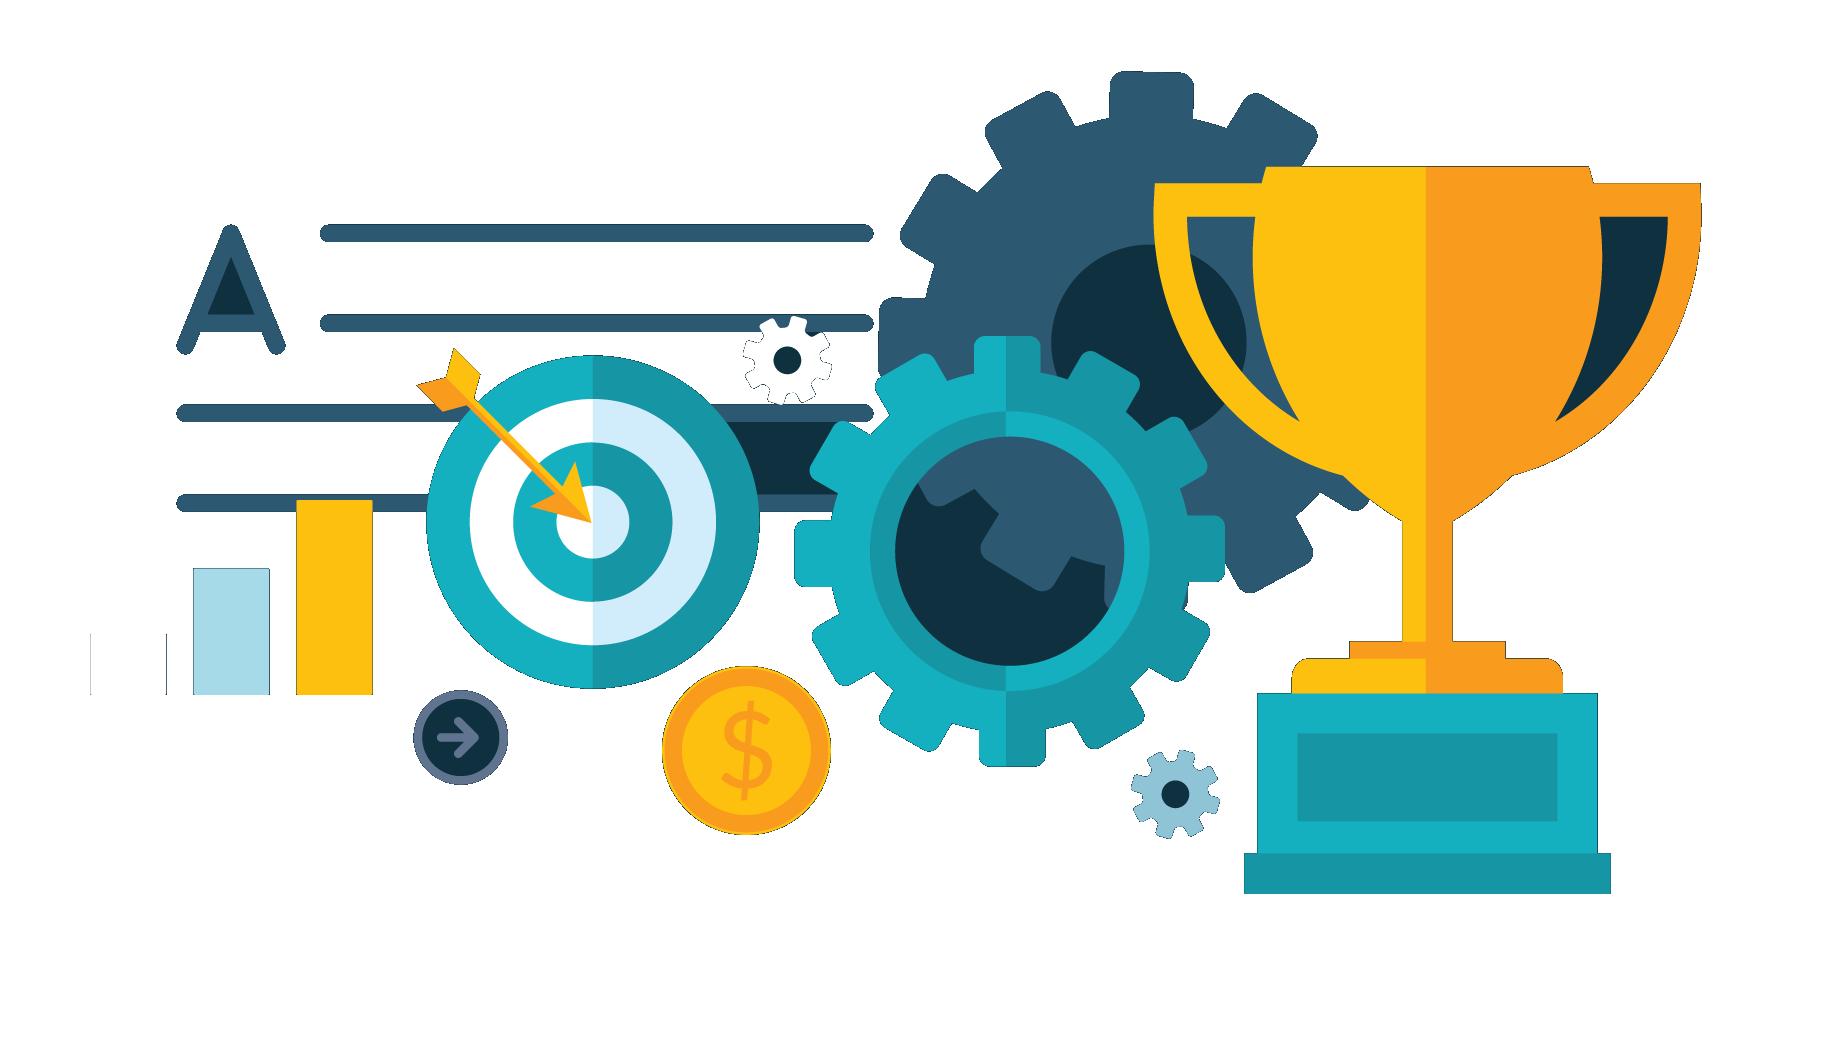 Manager clipart strategic management. Develop implement effective sales